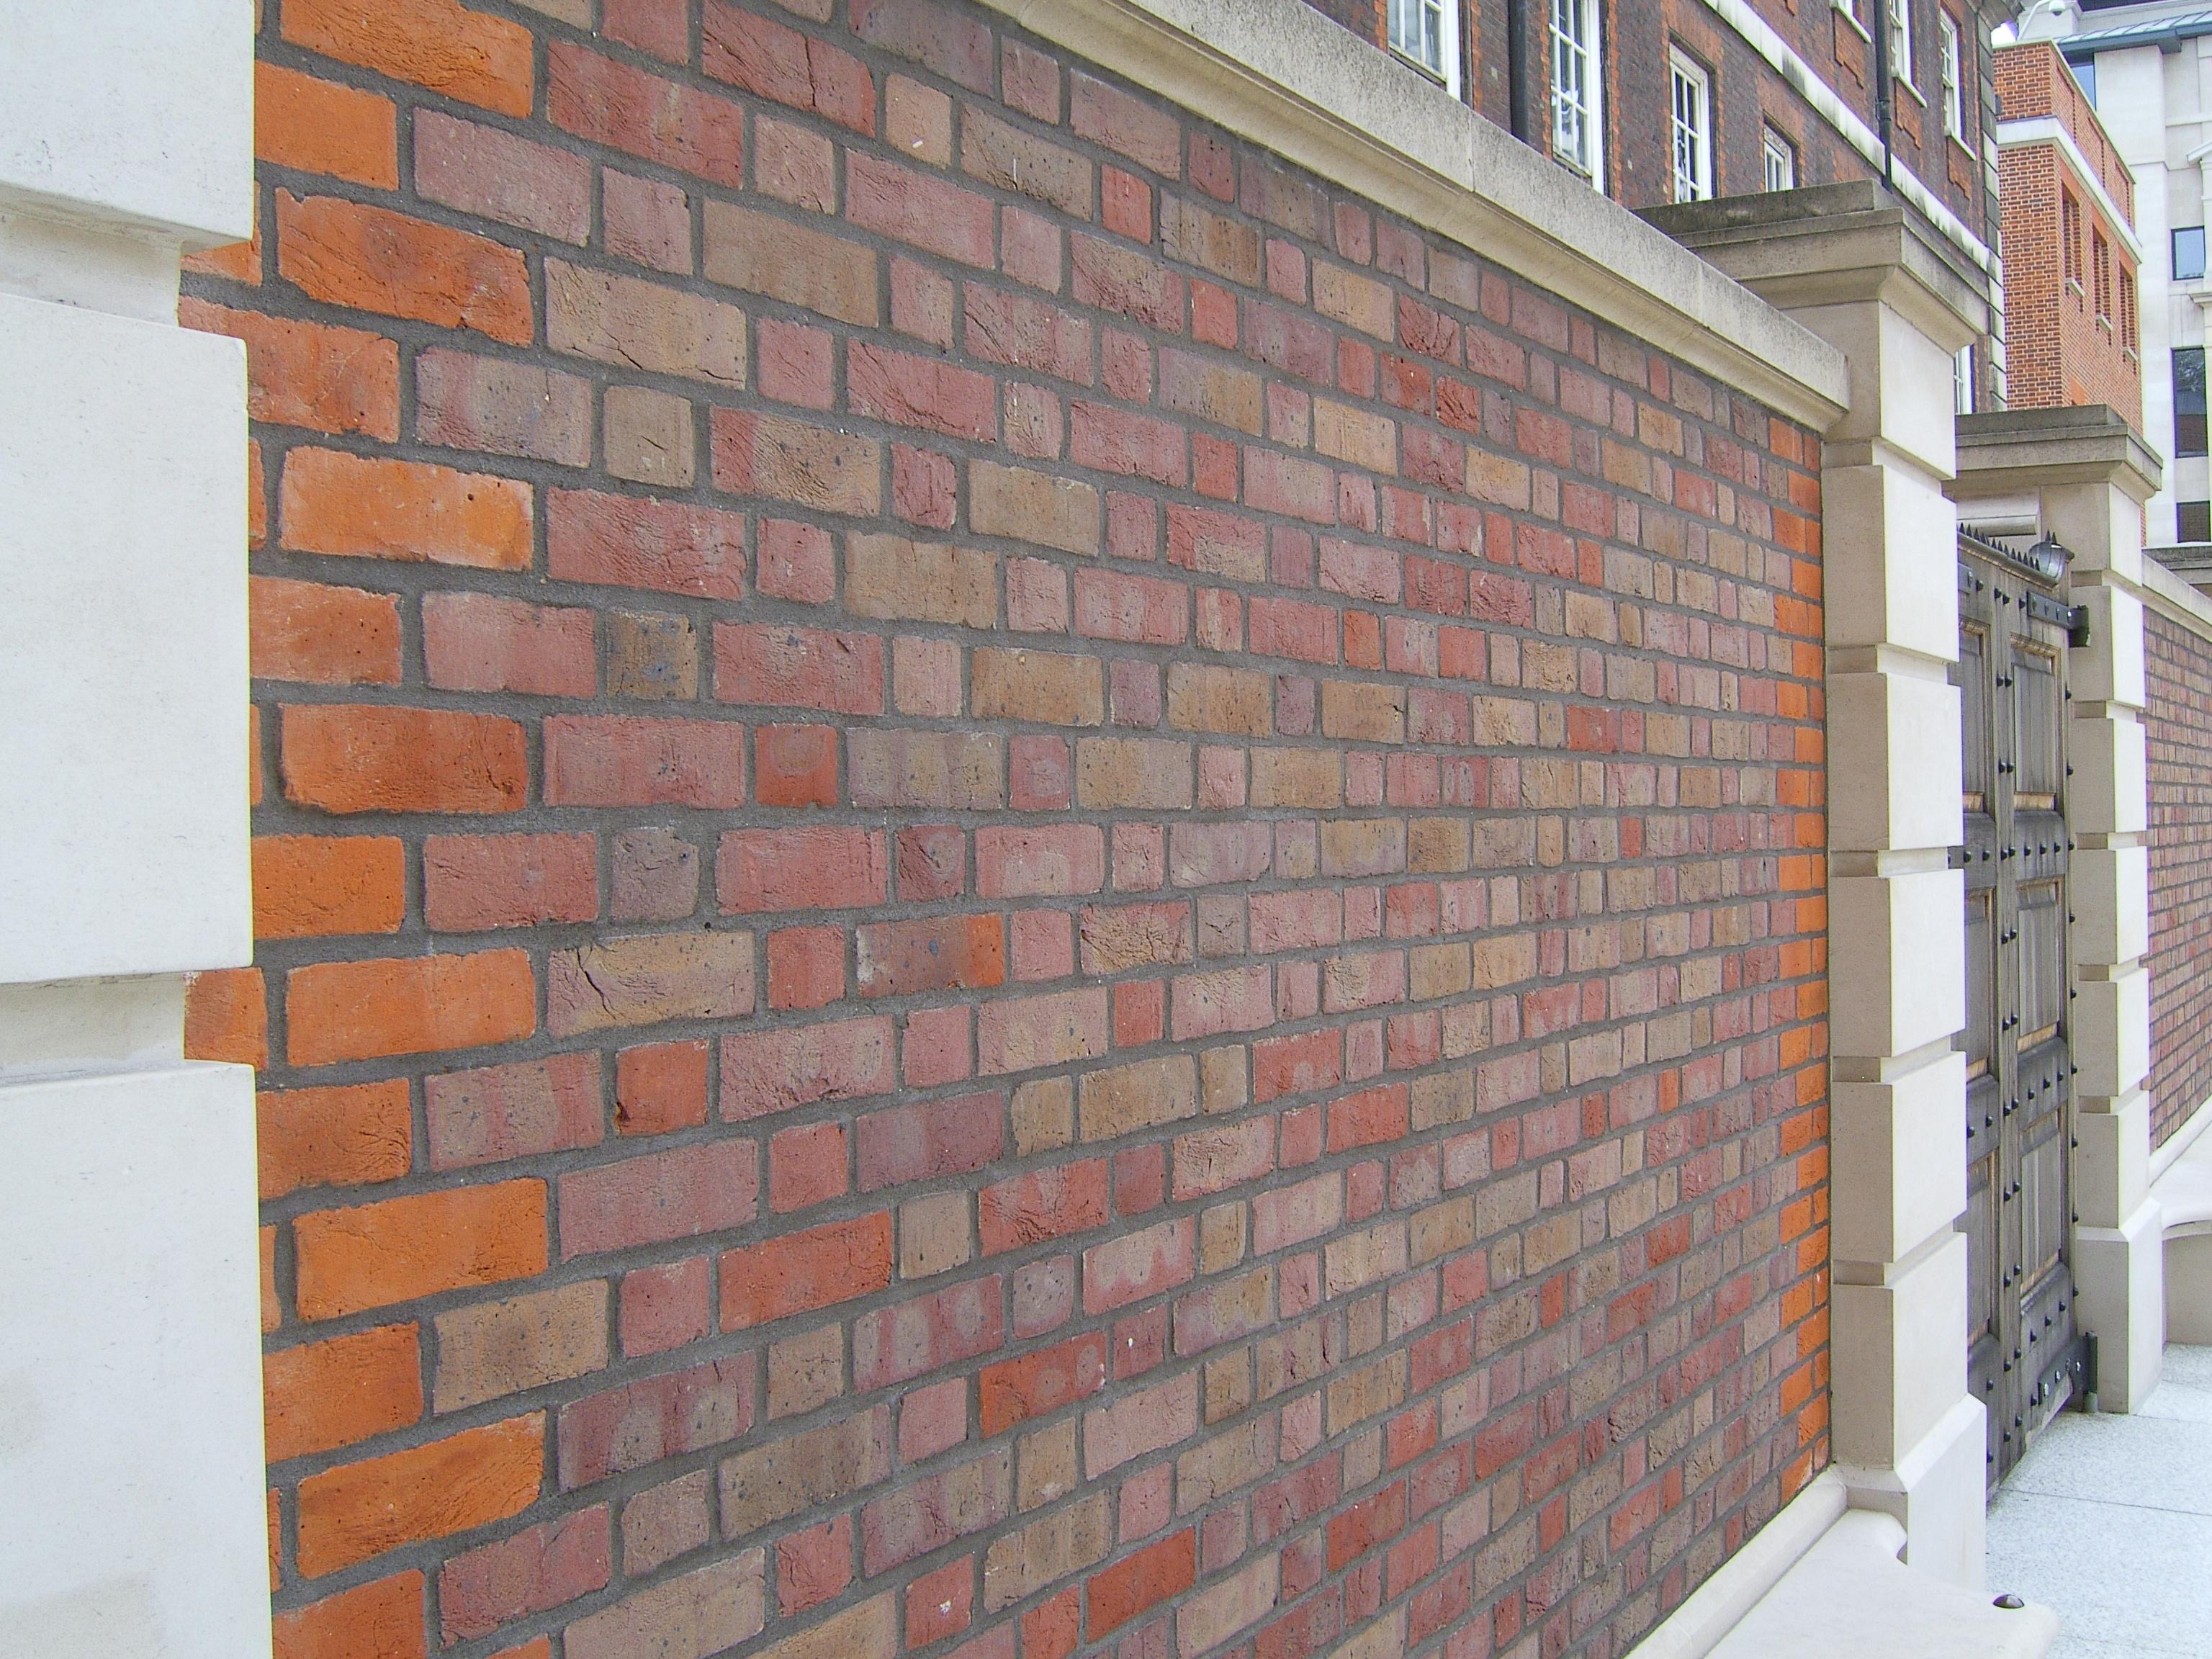 Bricks - Handmade Dark Multi